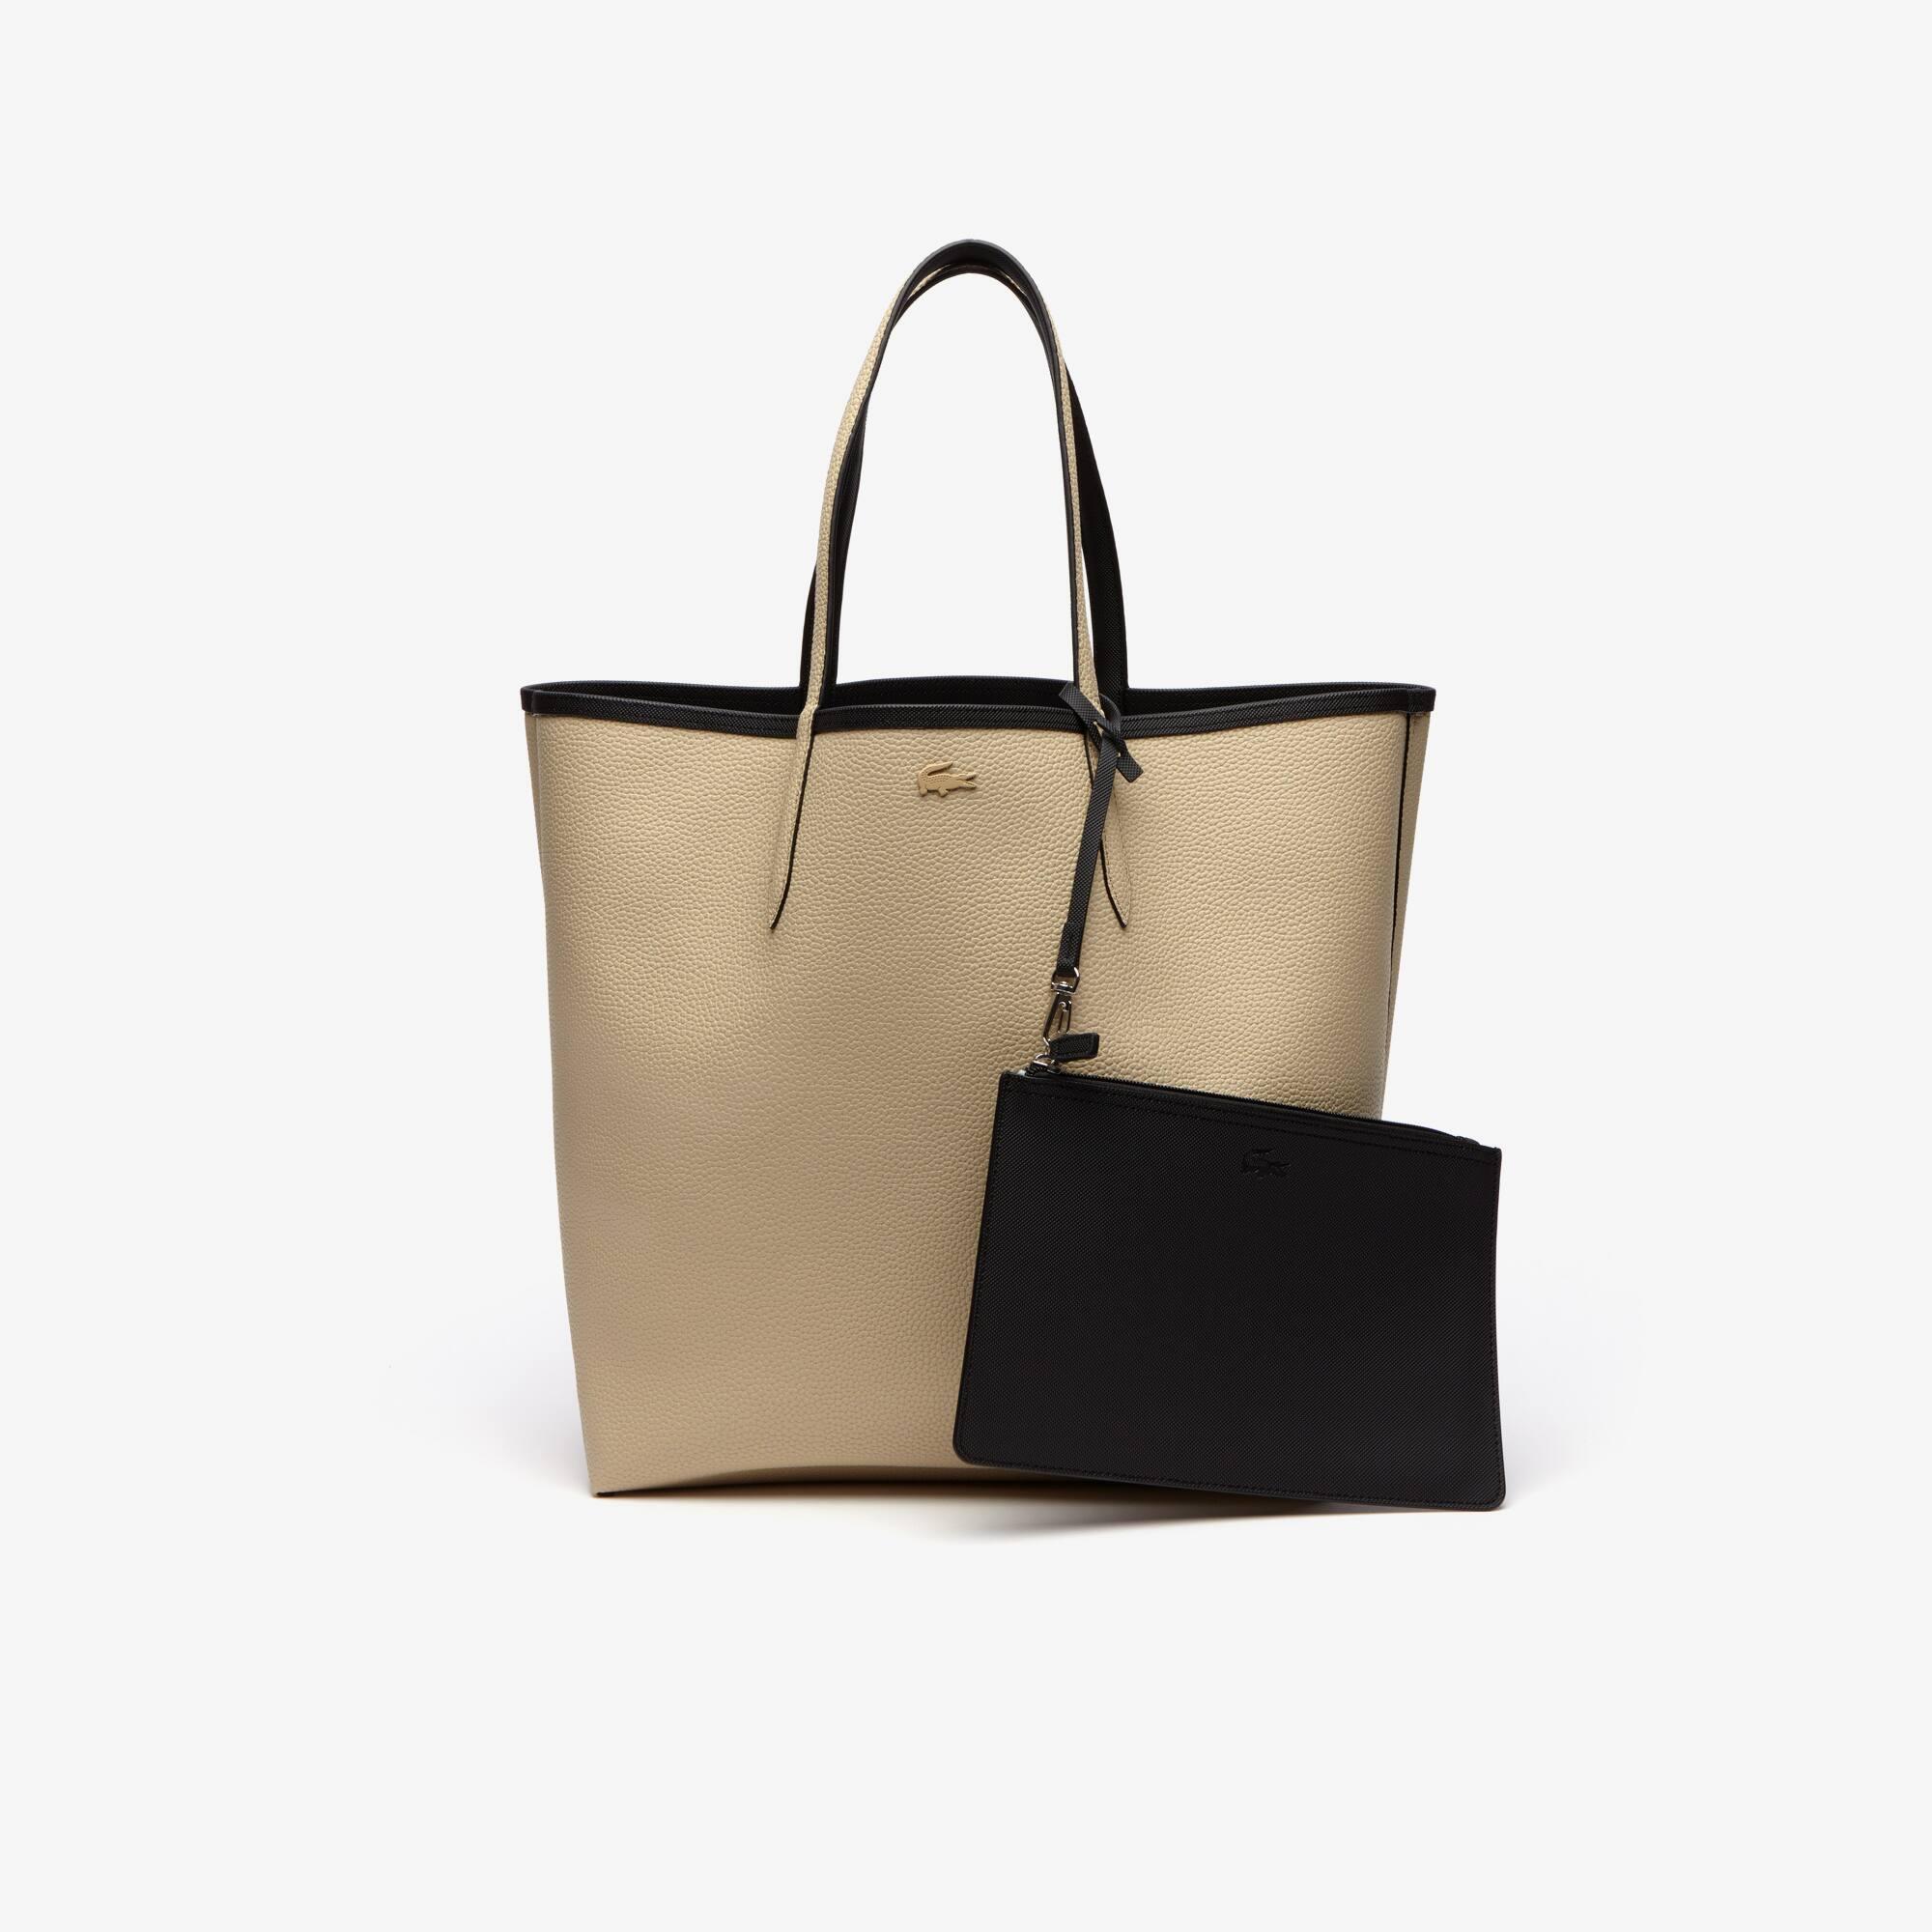 Grand sac cabas Anna réversible bicolore